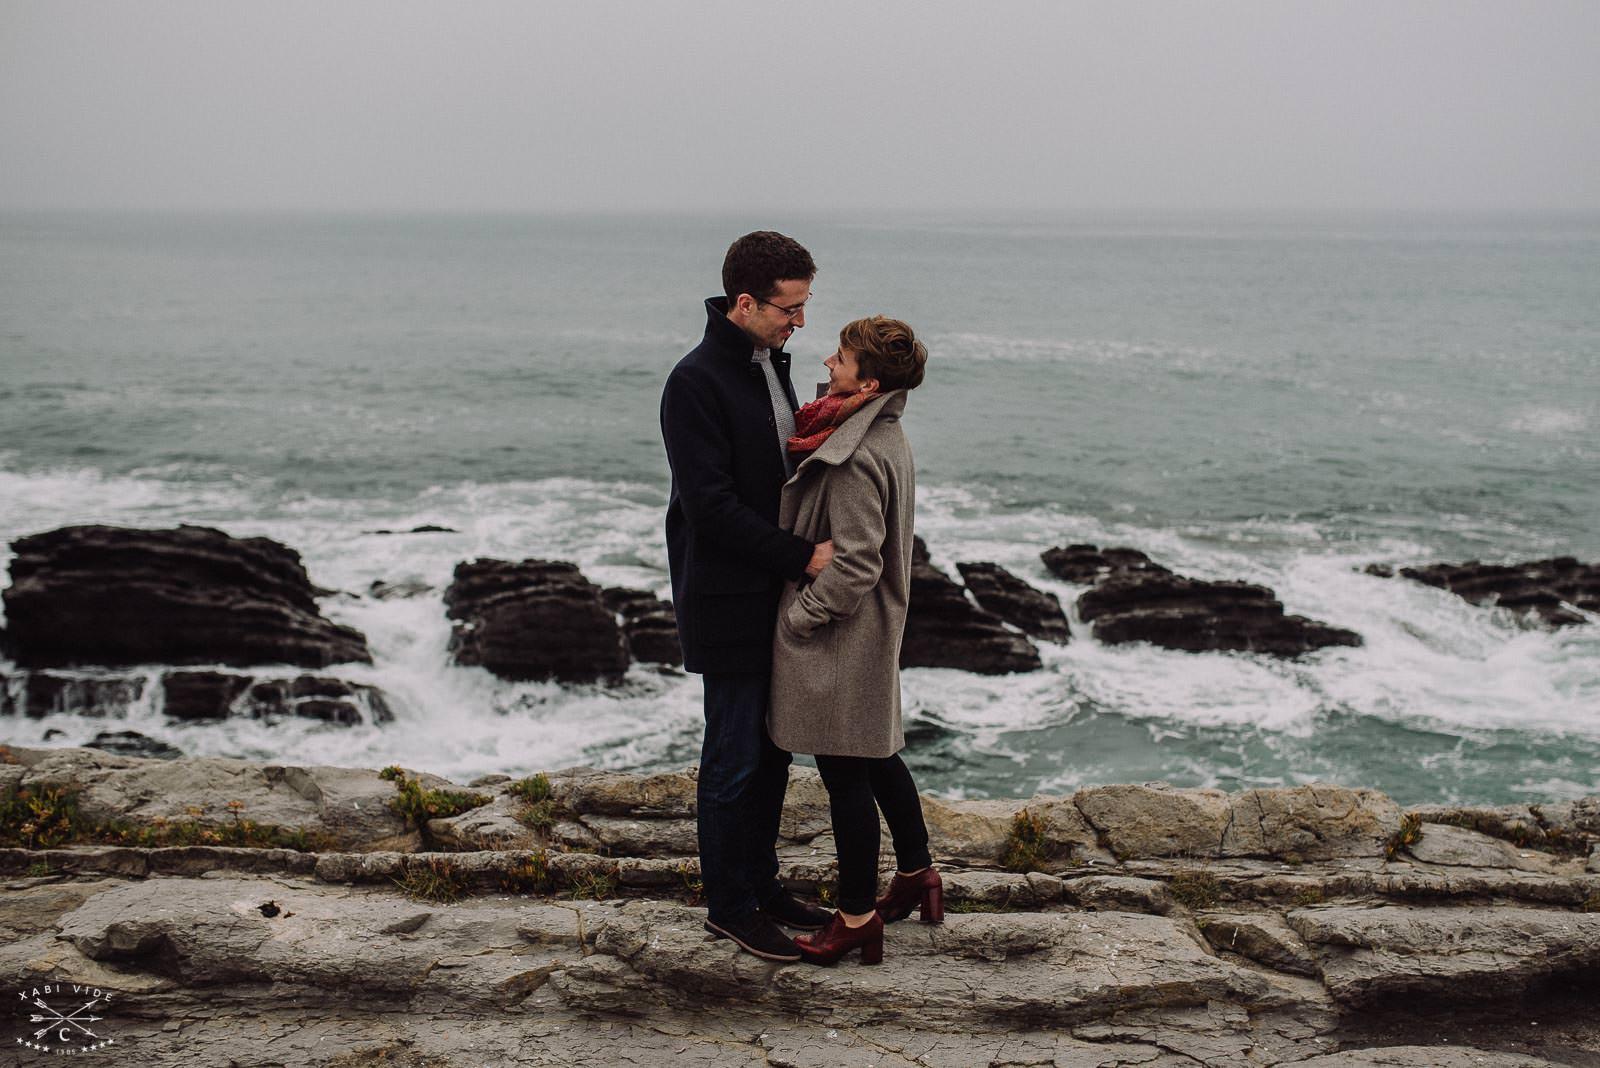 m+e fotografo de boda en euskadi-6